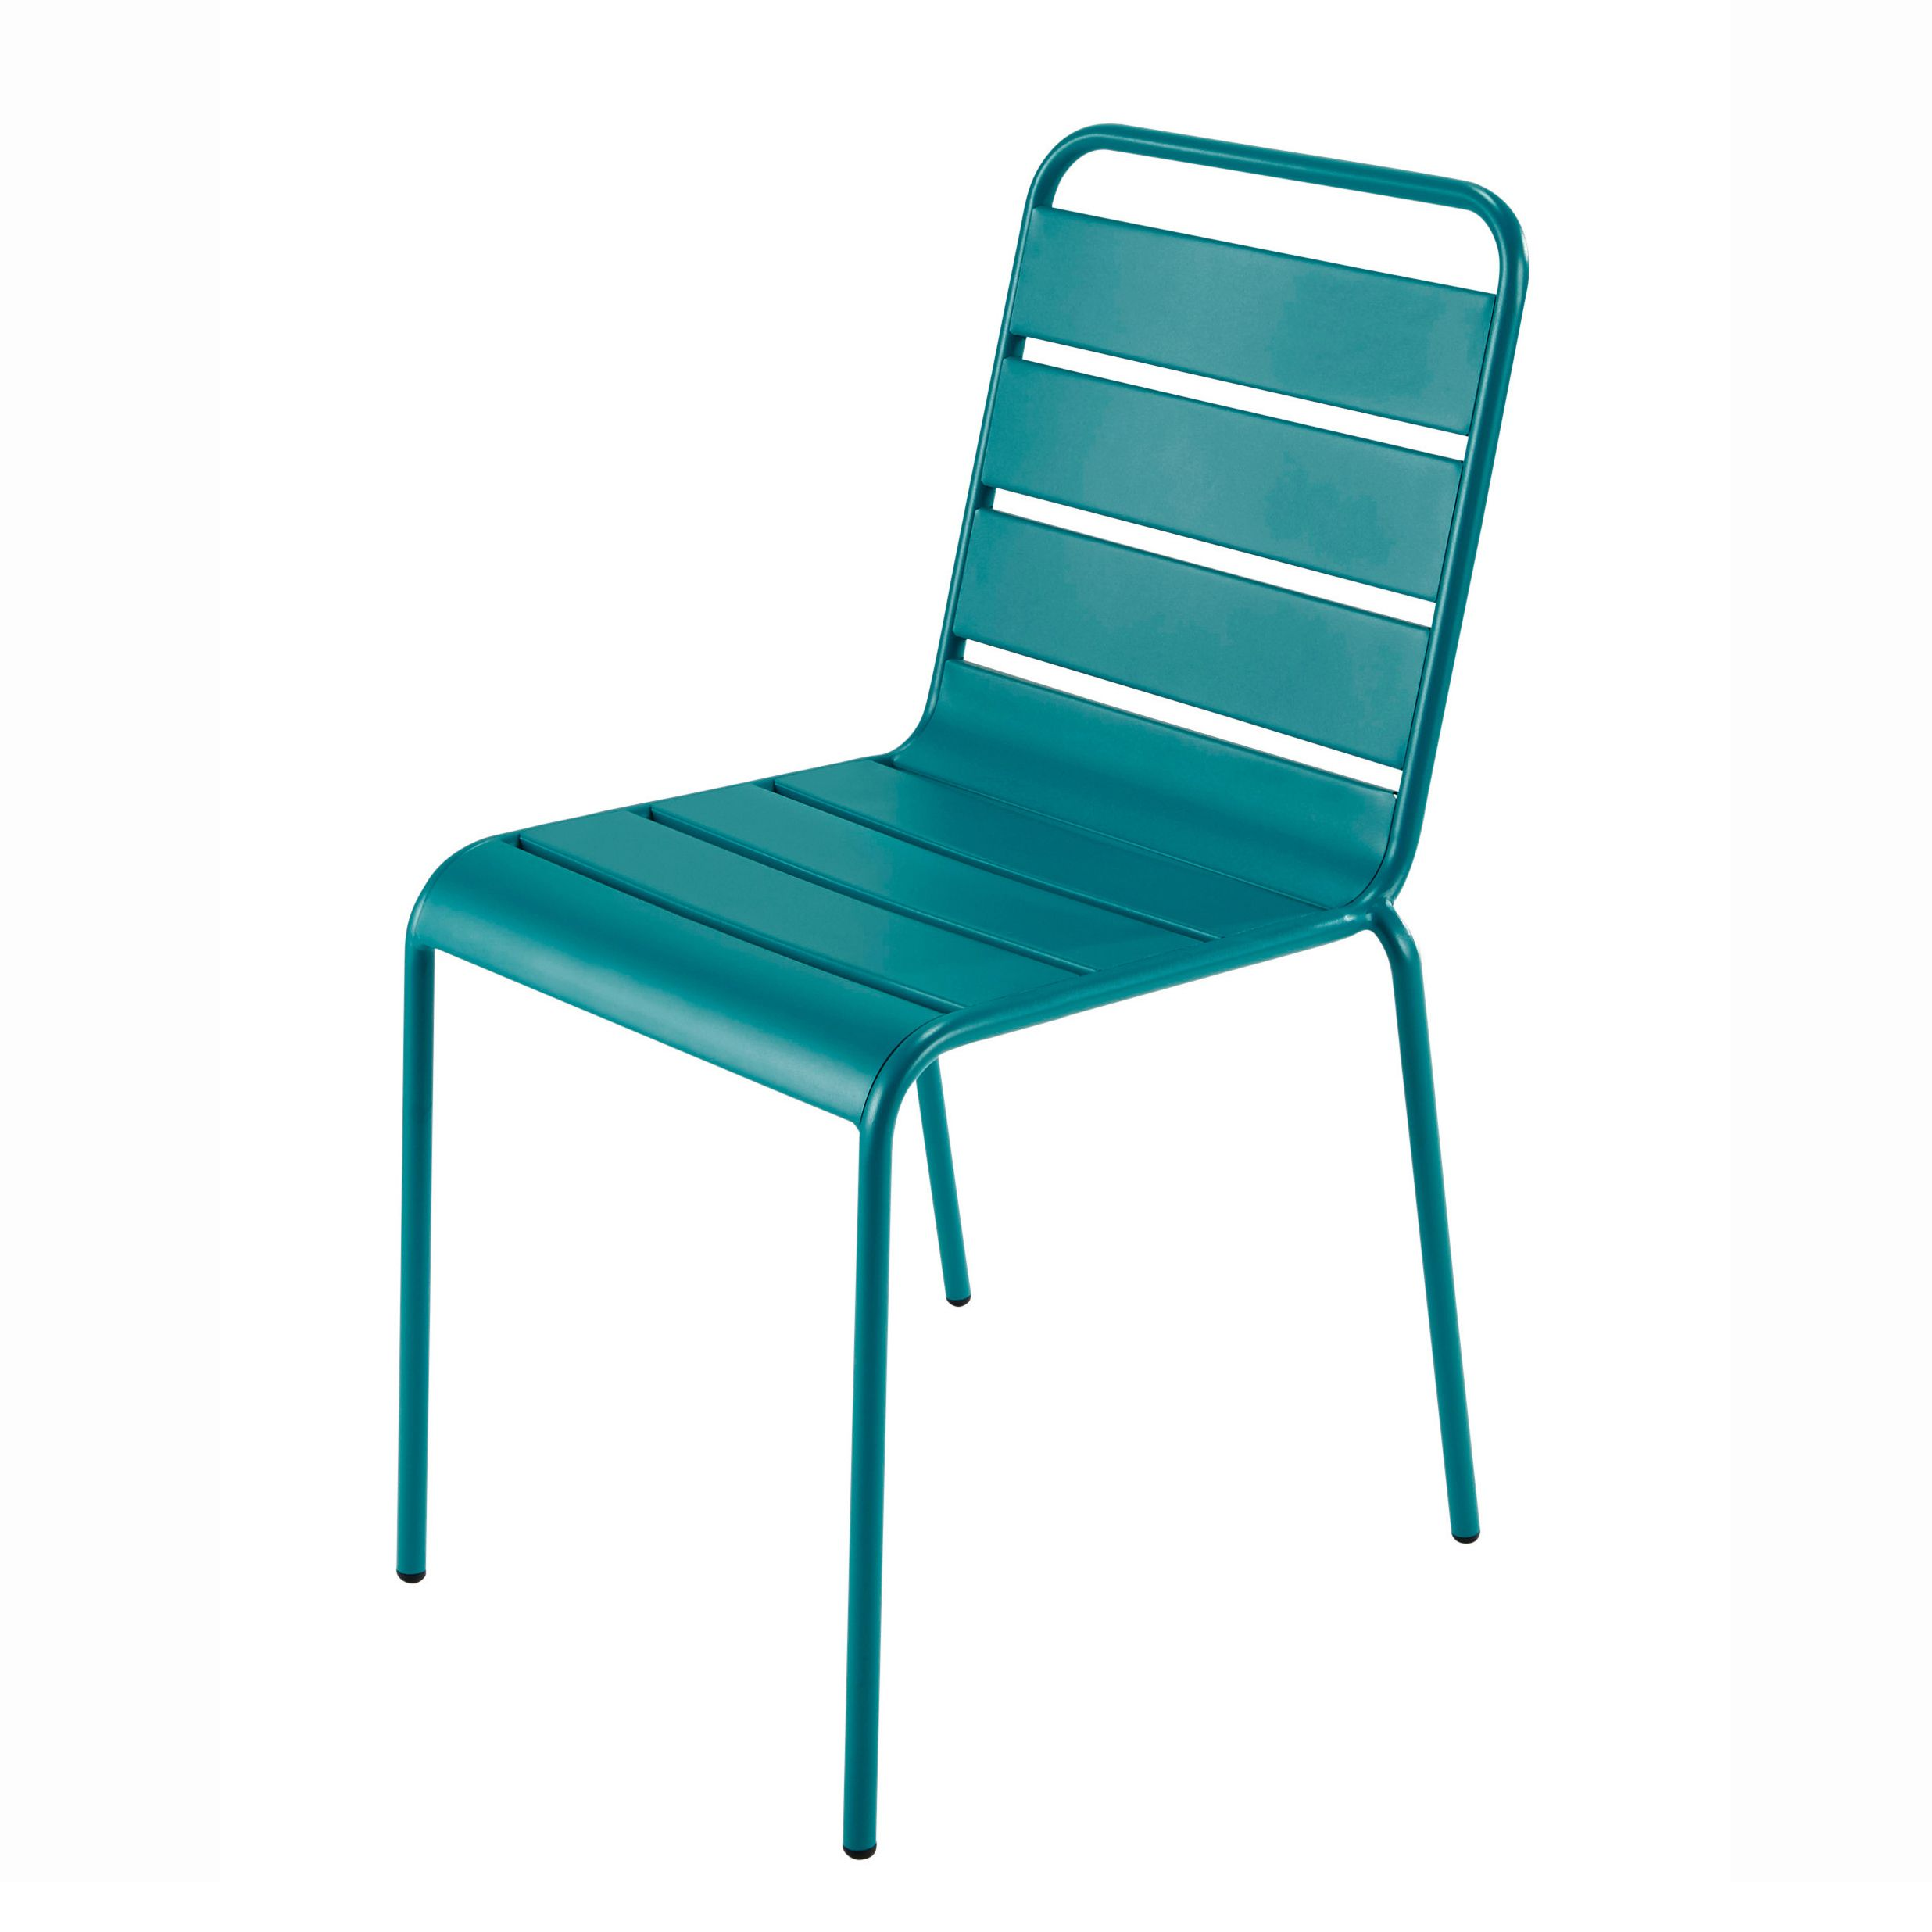 b3a25d4652da0a2ac94f2a57373e3f10 Unique De Chaise De Jardin Aluminium Des Idées